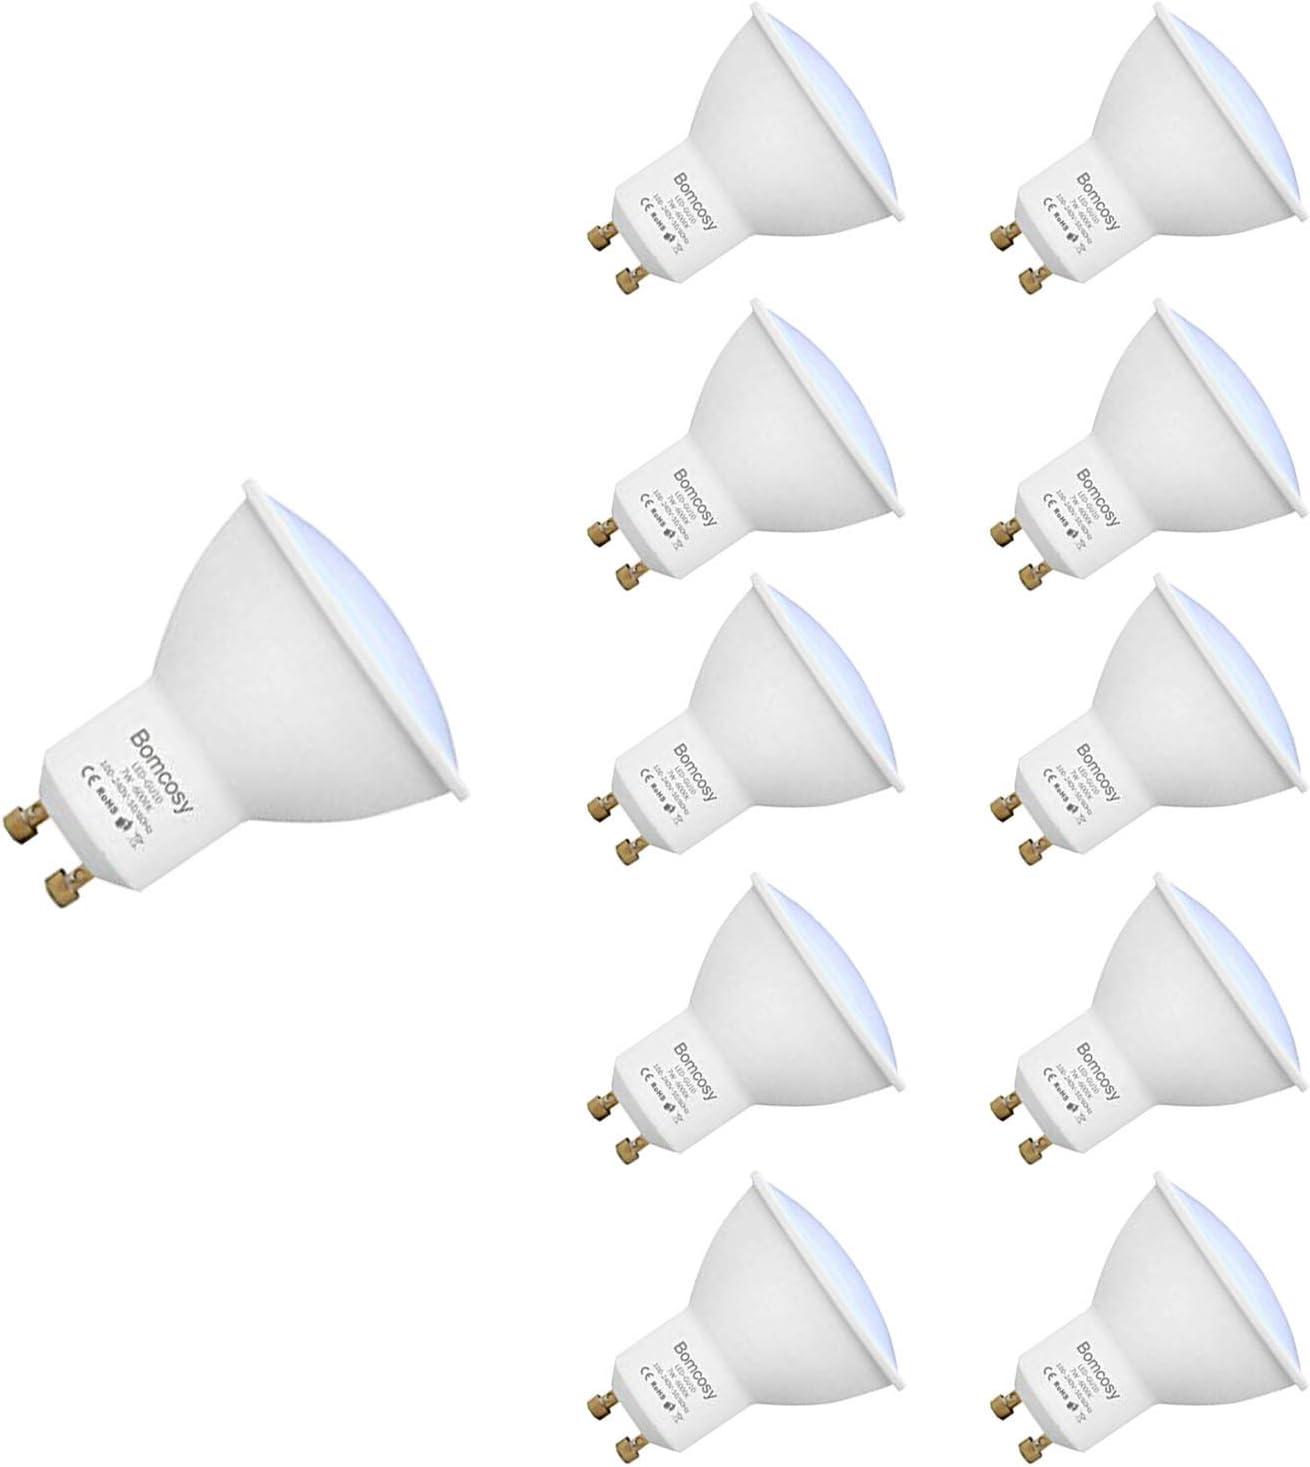 Bombillas LED, GU10 7w Equivalente 60W Halógena, 6000K Blanco Frío, 600Lm, 120 Degree ángulo AC 220-240V, Pack de 10